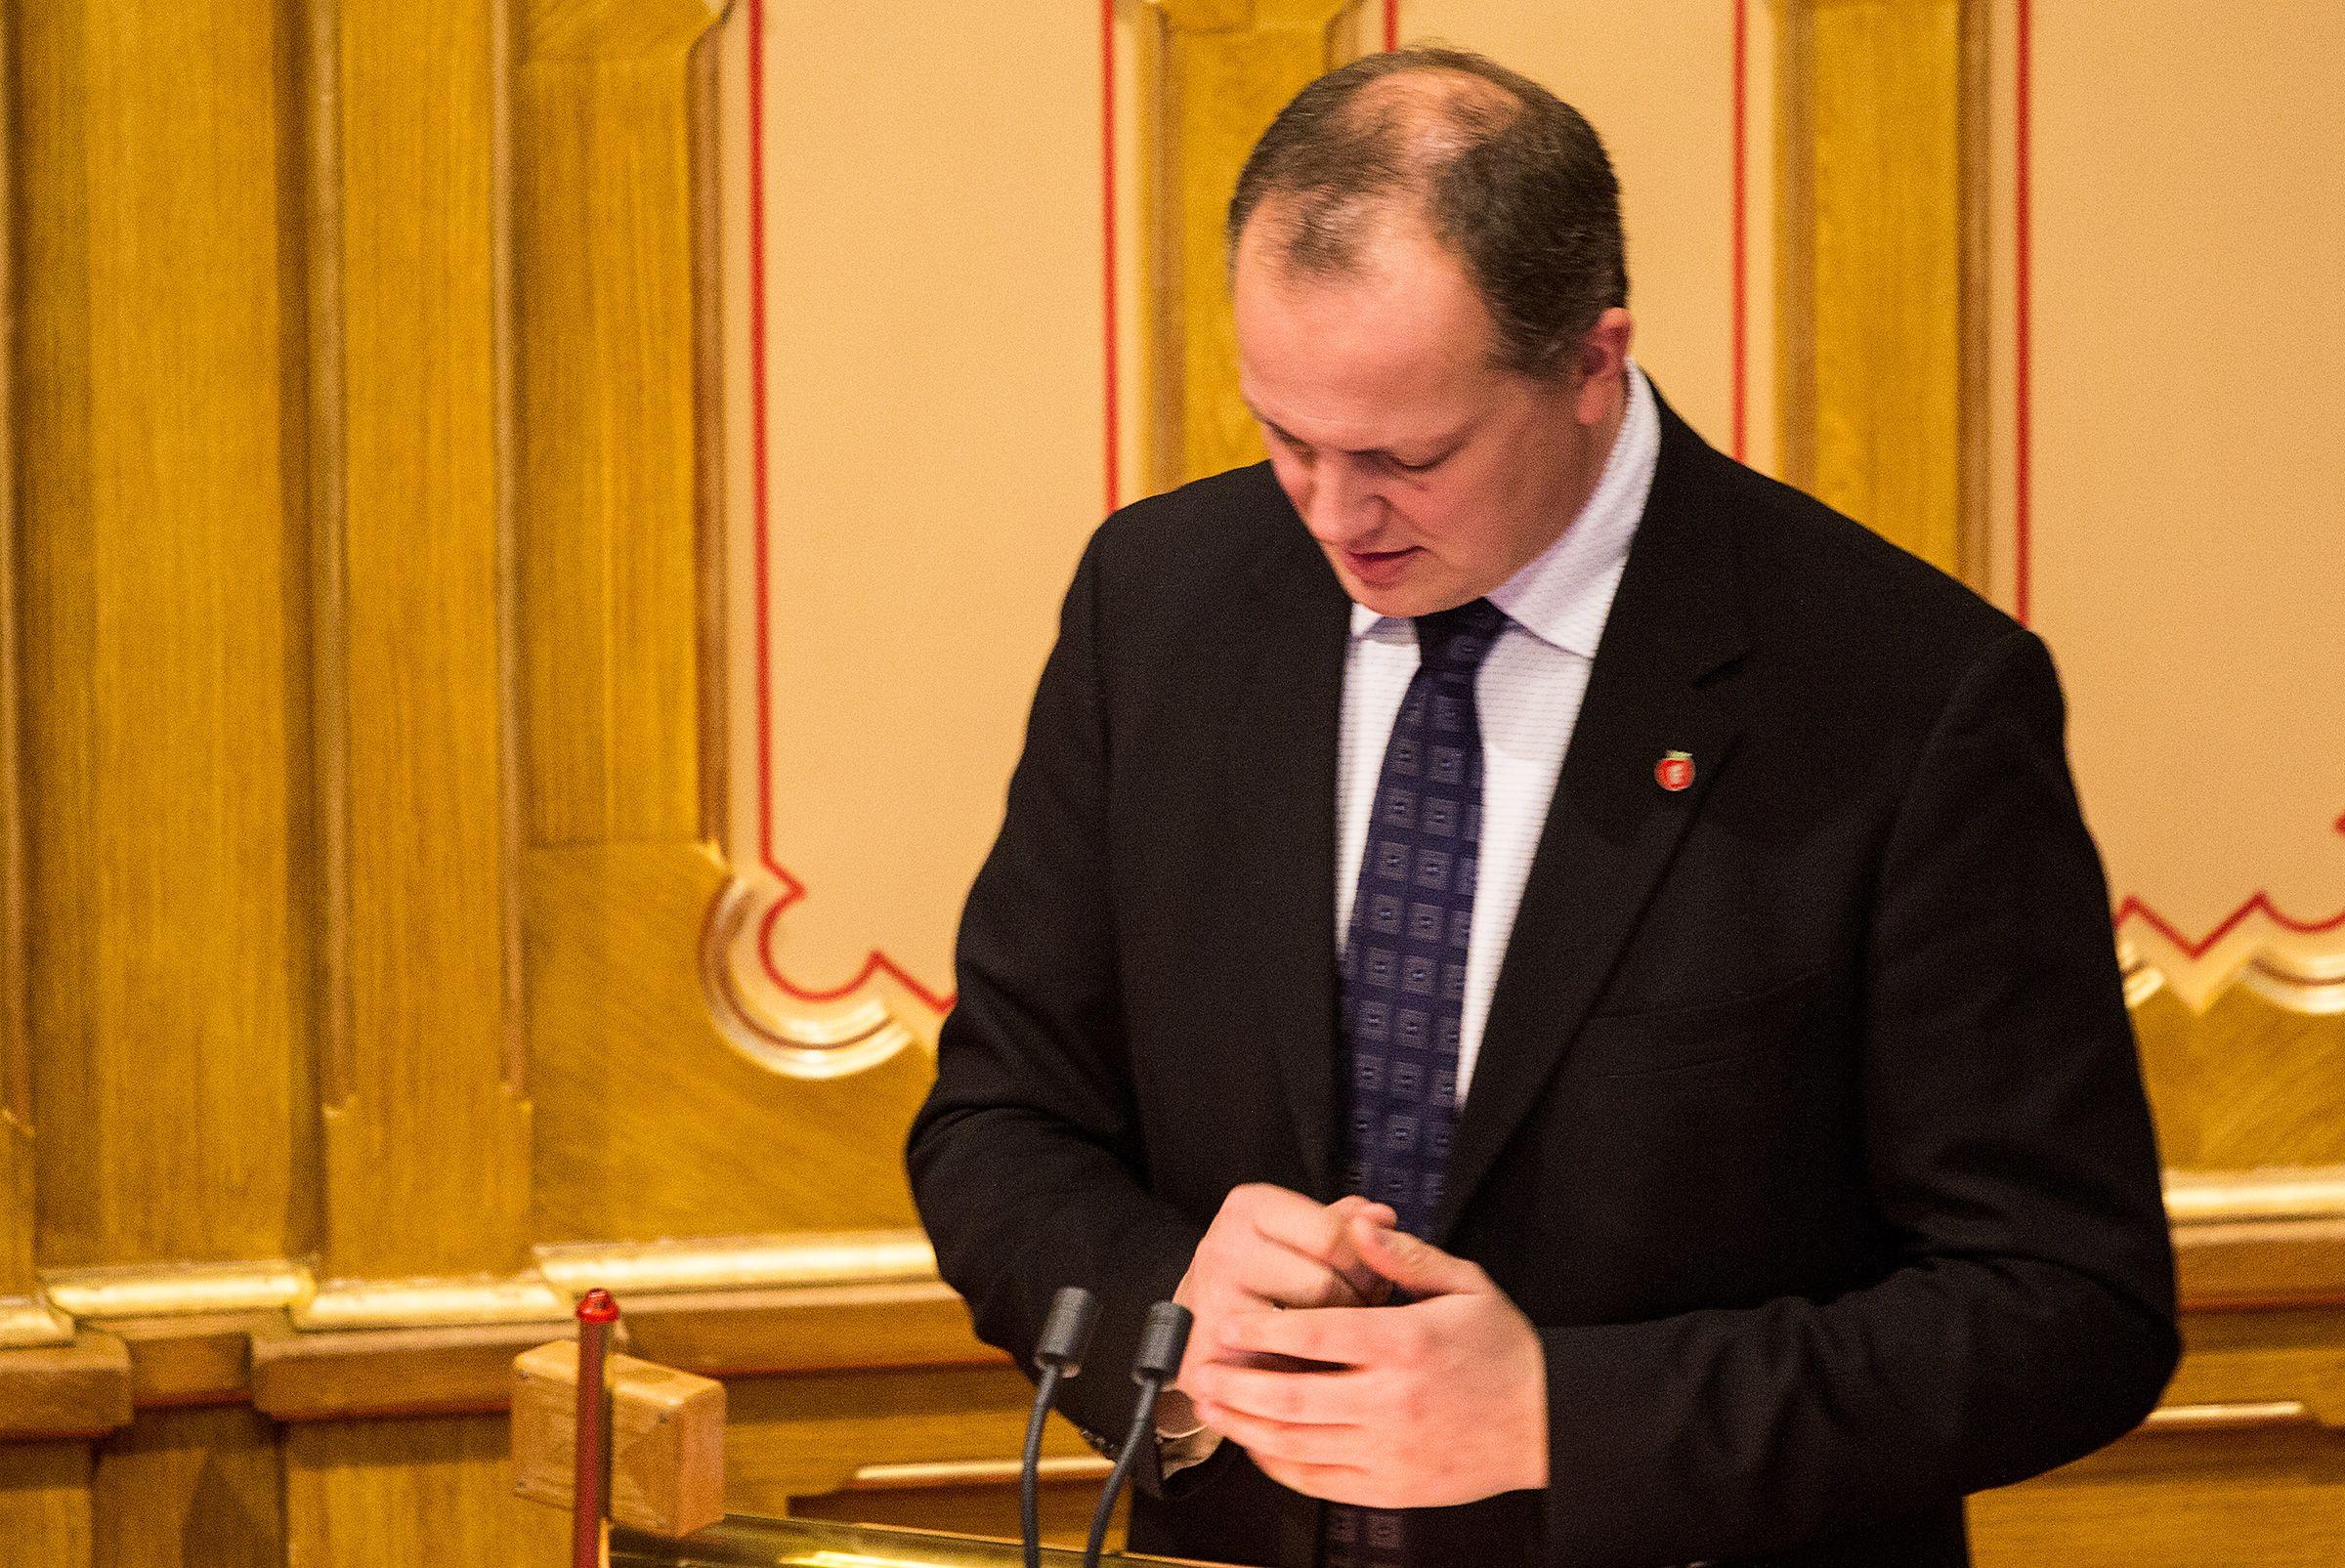 Samferdselsminister Ketil Solvik-Olsen, Fremskrittspartiet.Foto: Varg Aamo, Hardware.no